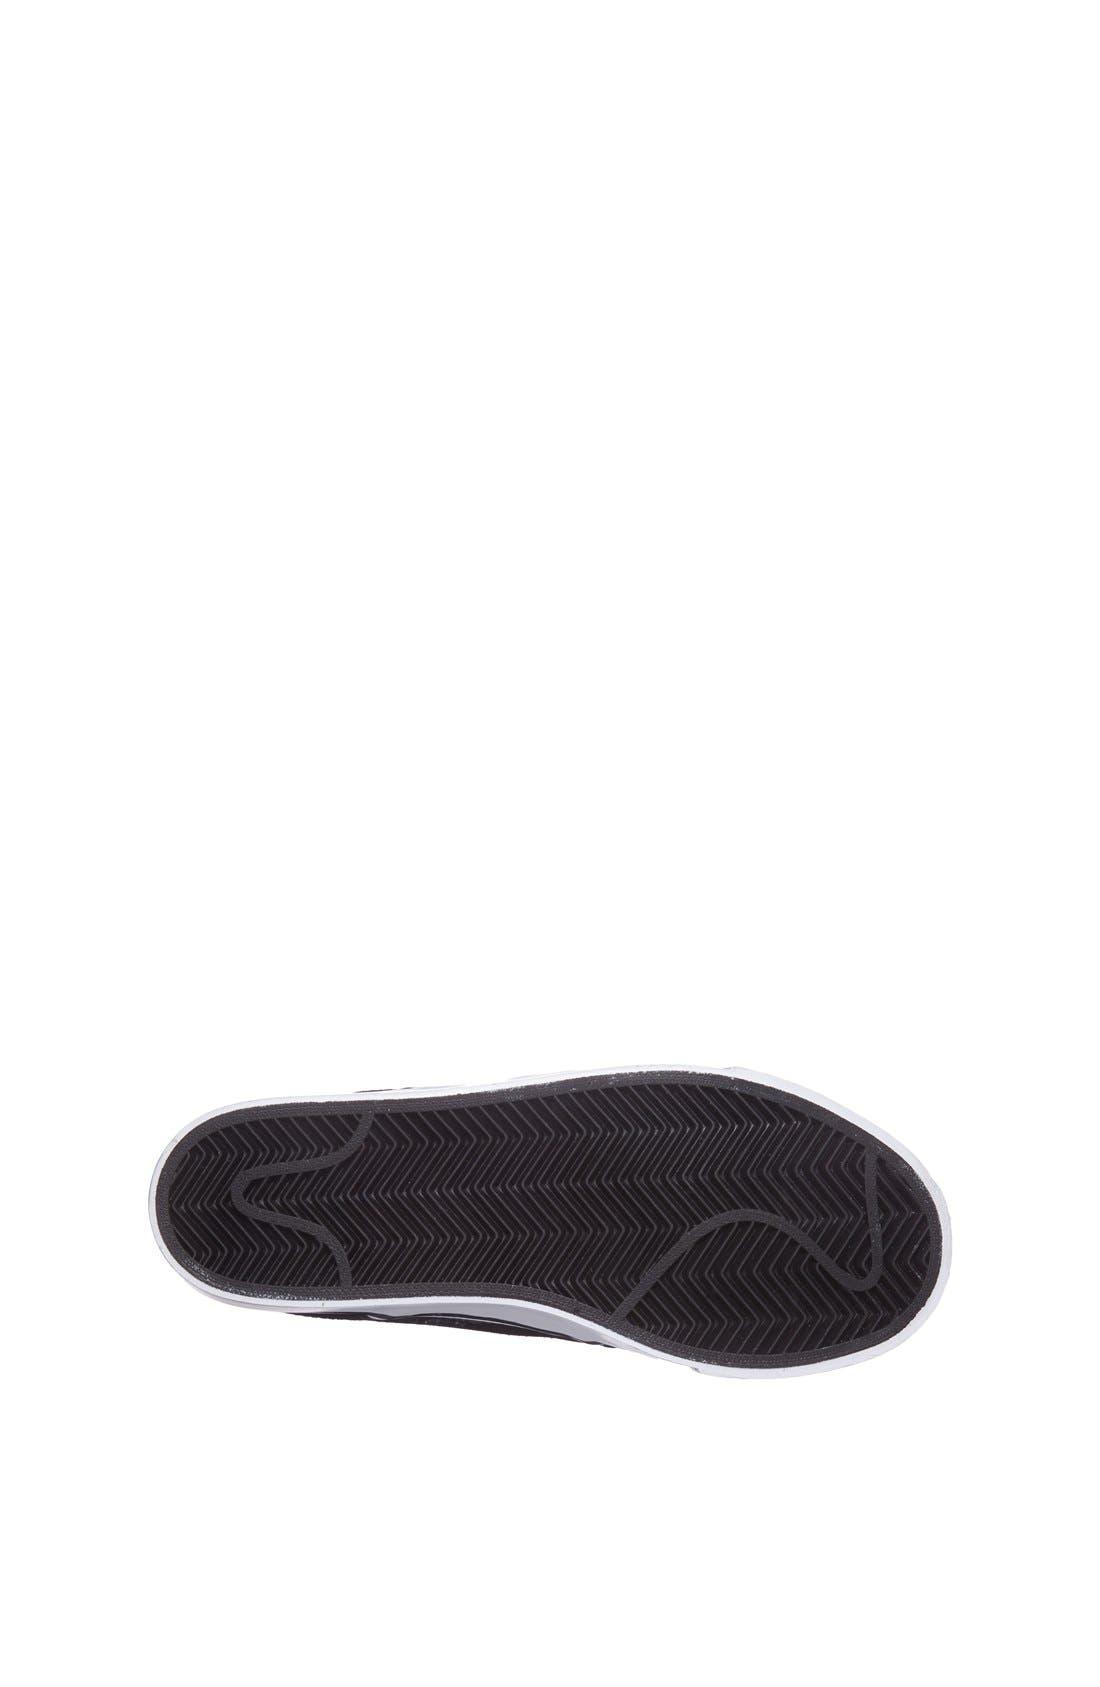 'Stefan Janoski' Sneaker,                             Alternate thumbnail 34, color,